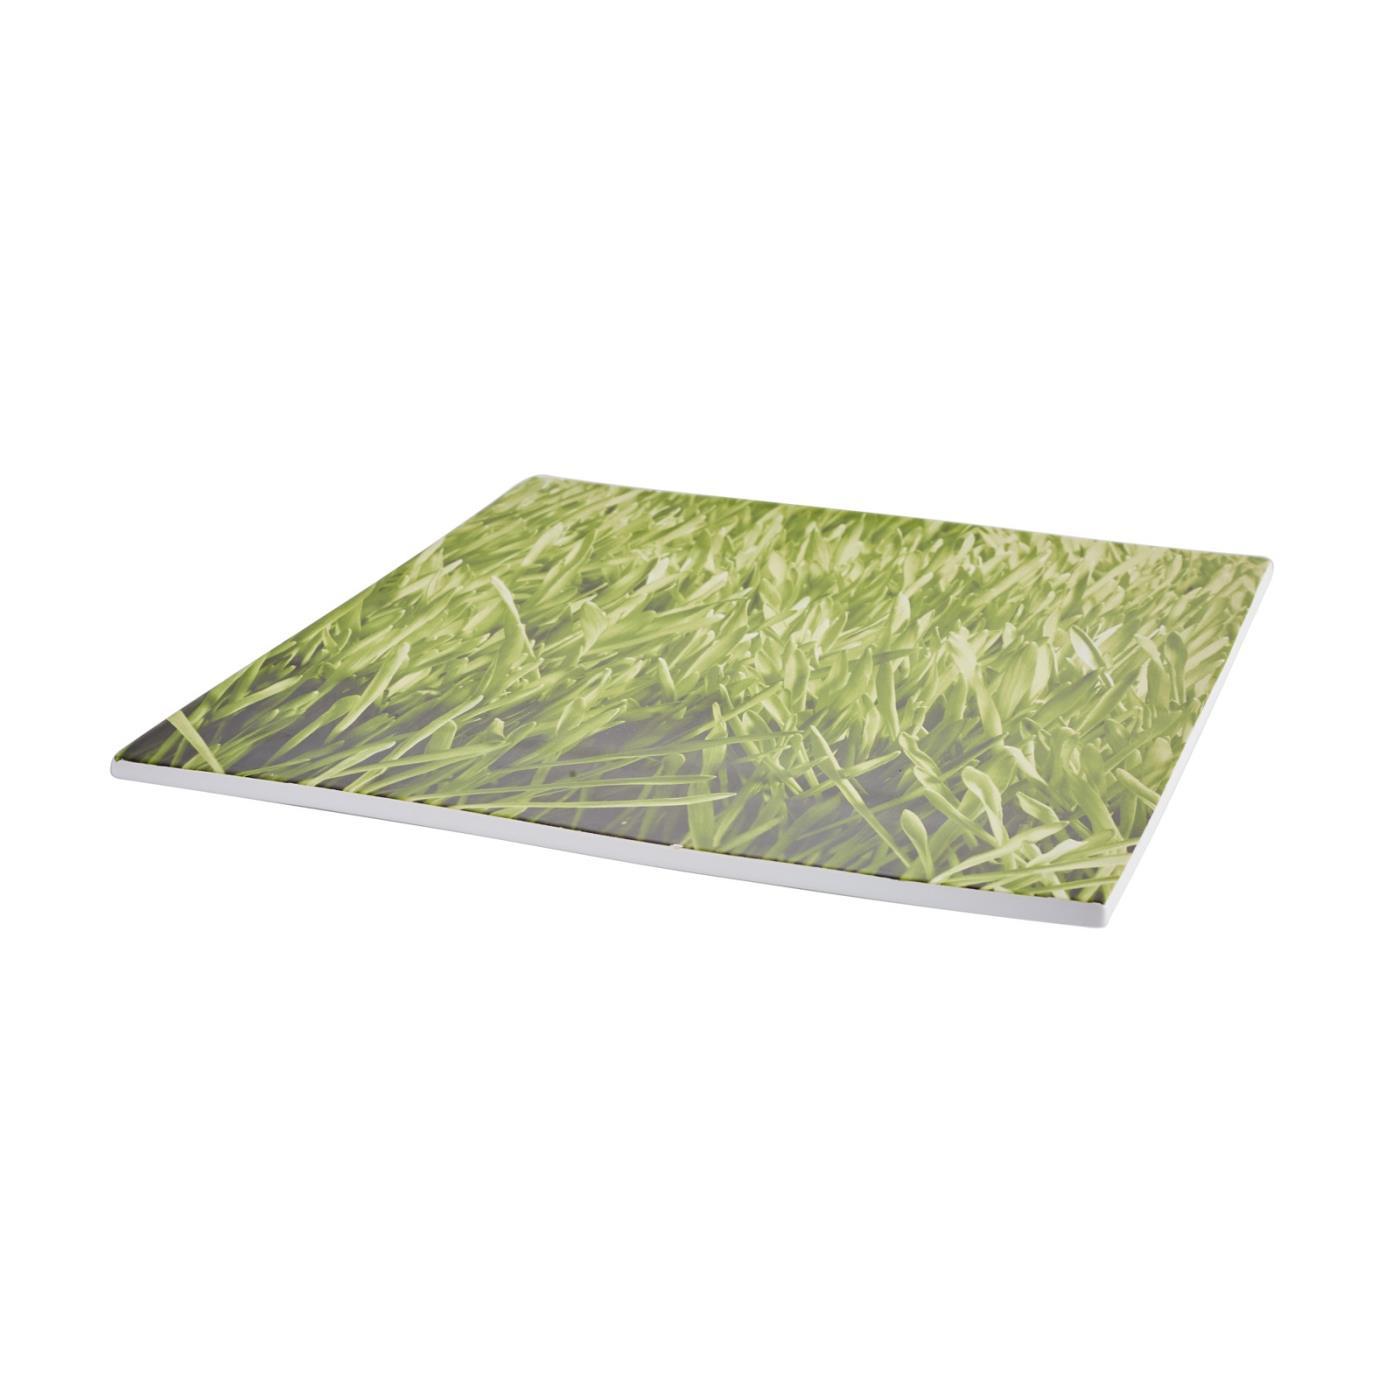 Grass Ceramic Square Platter